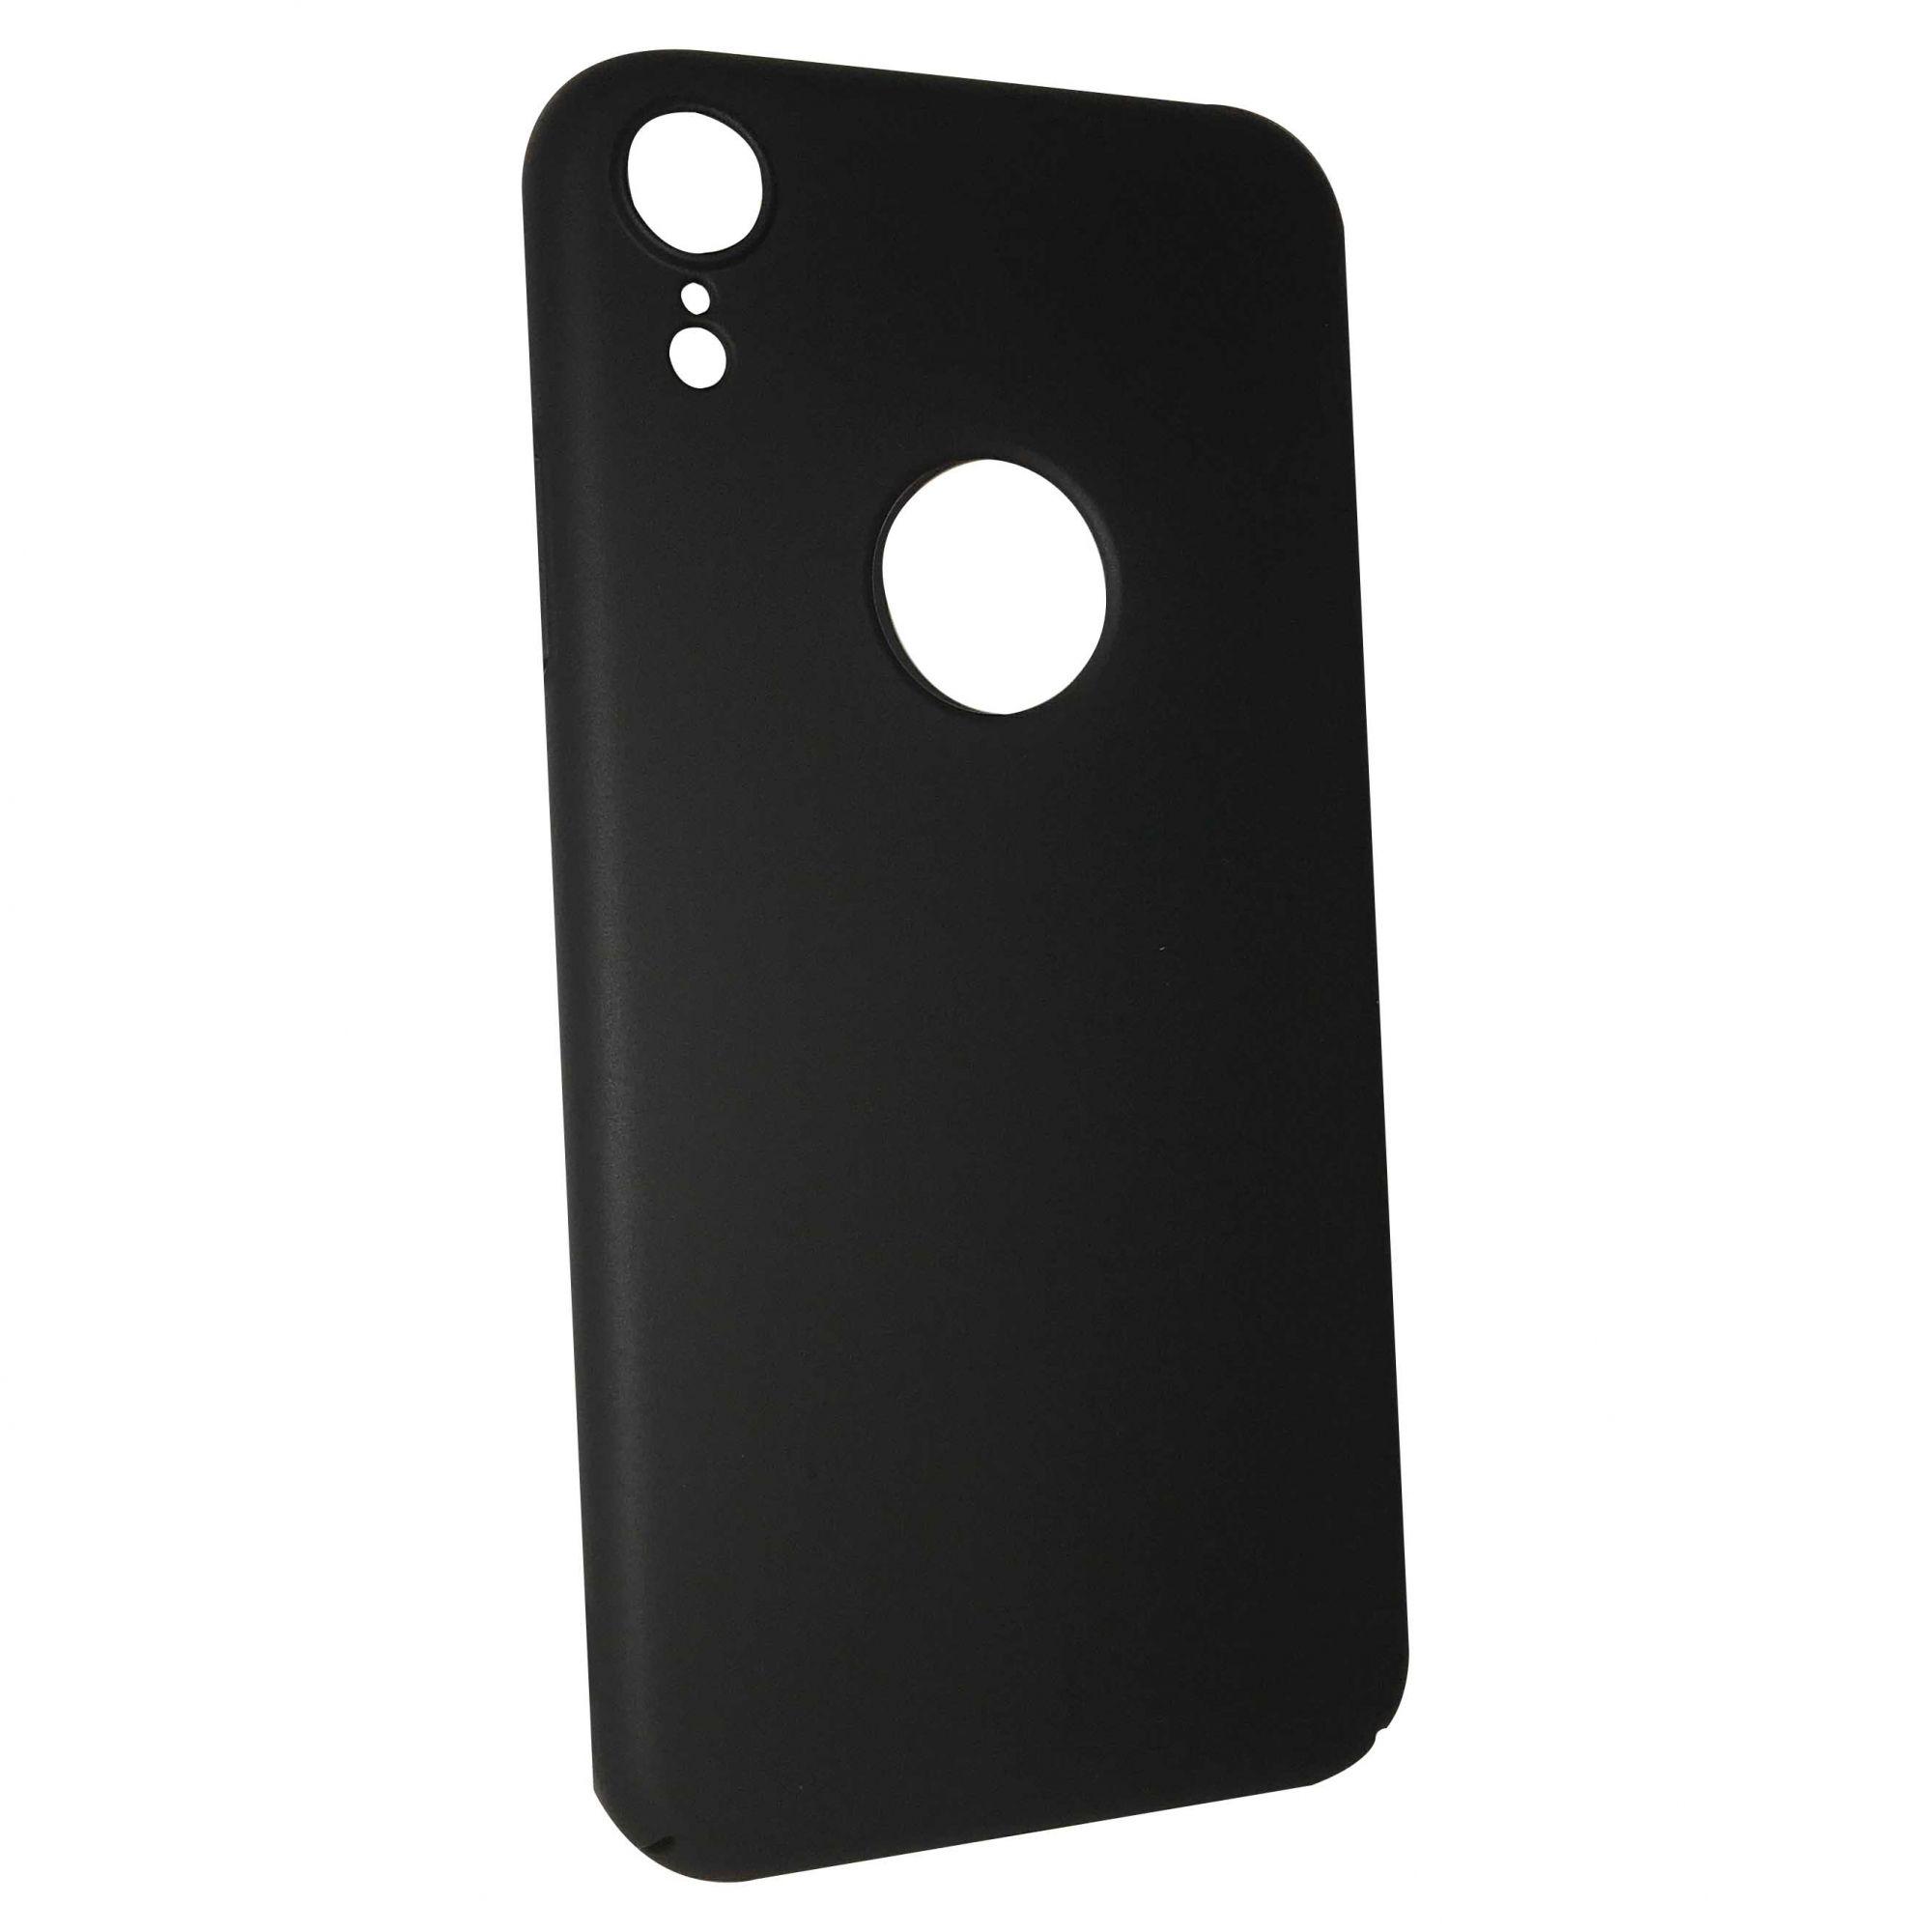 Capa iKase Fit Case Apple iPhone XR - Preta